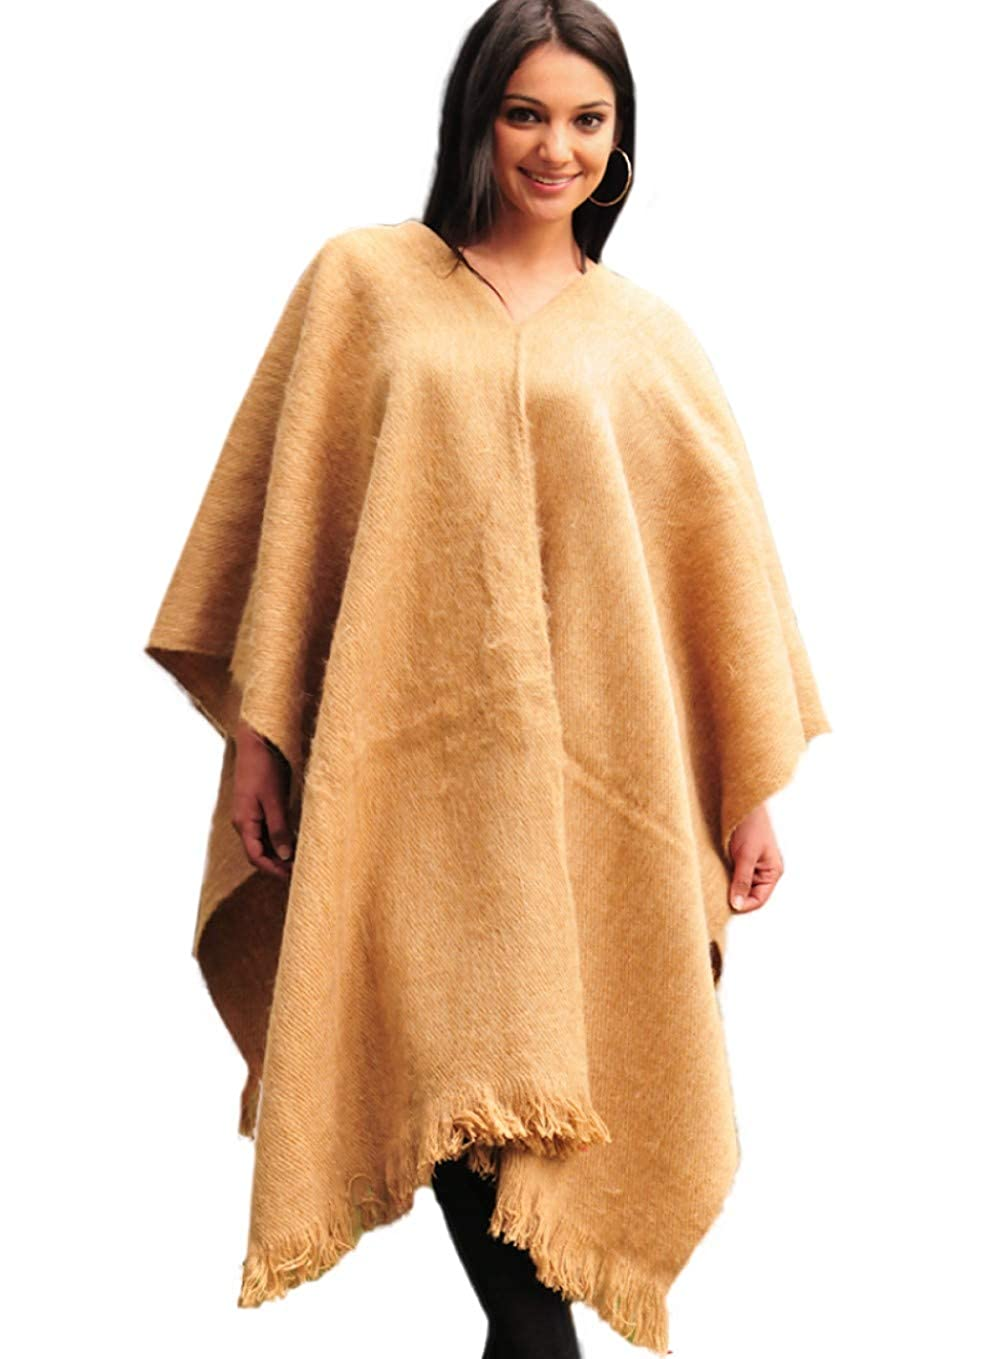 Gamboa Donna Morbida Come la Seta Marrone Chiaro Elegante Alpaca Ruana